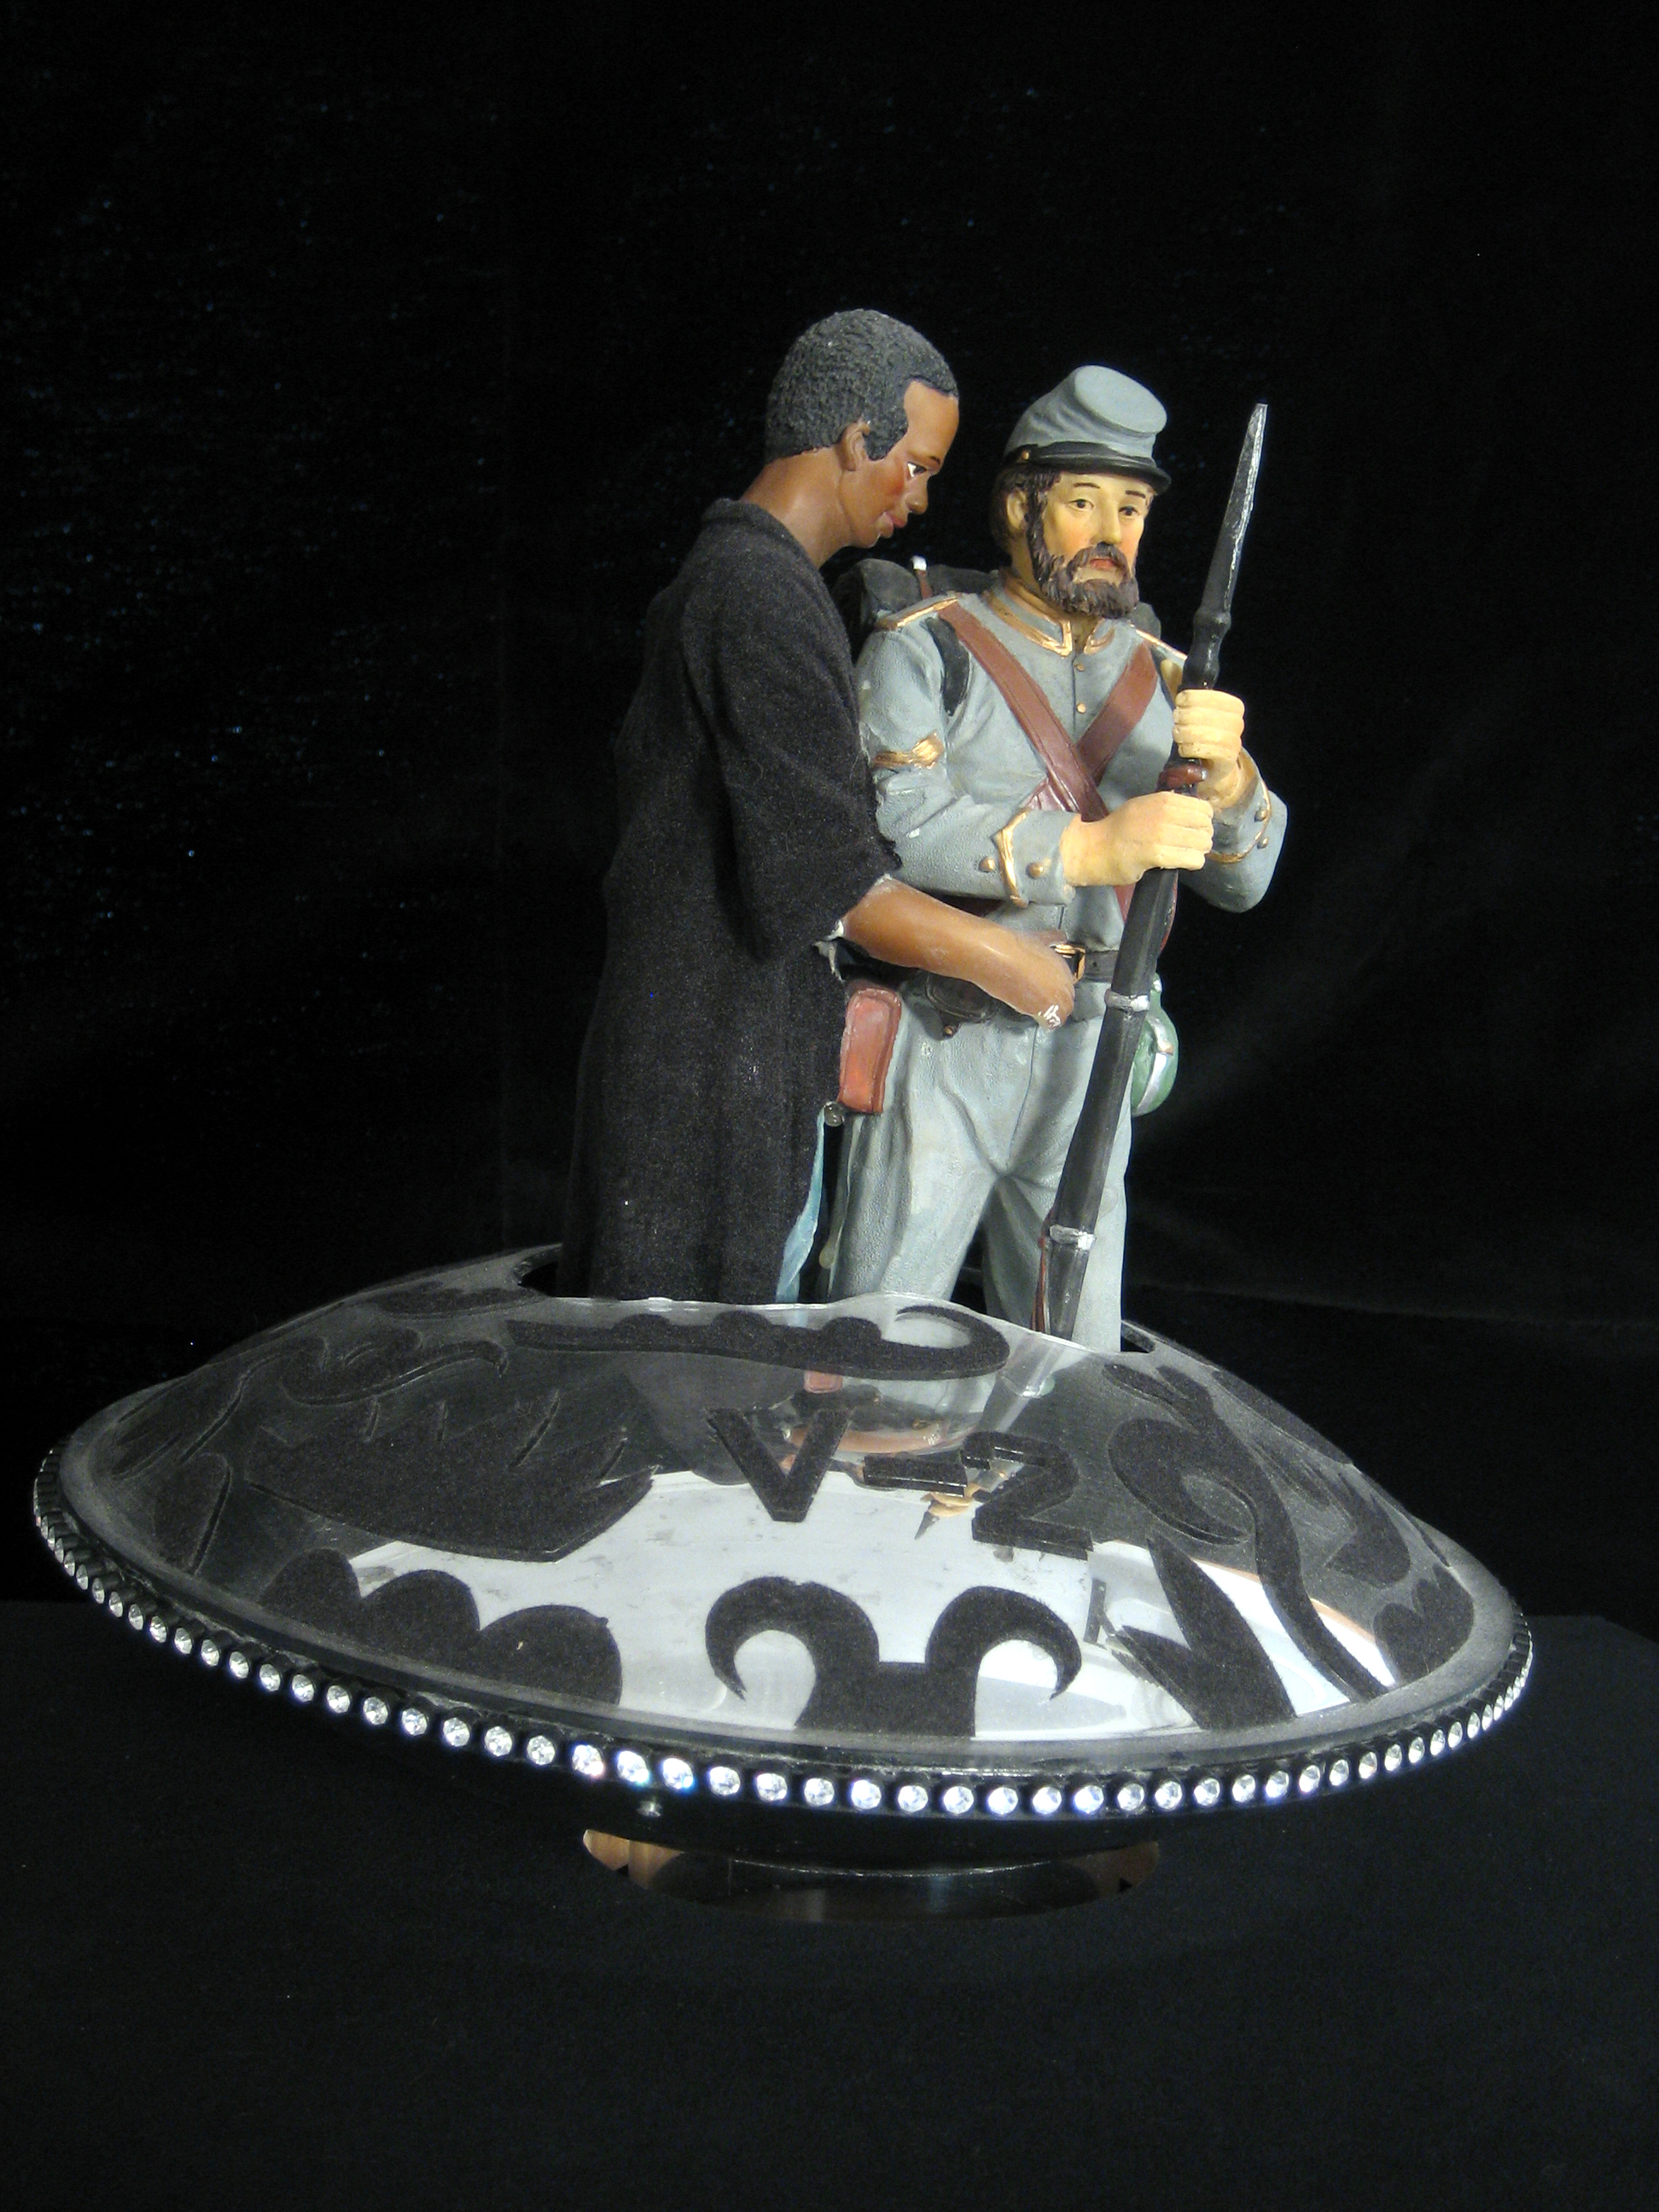 Adam and Steve (V Ship 2) - ceramic parts, plexiglass, velour flocking, rhinestones, and rotating base21 x 18 x 18 in.